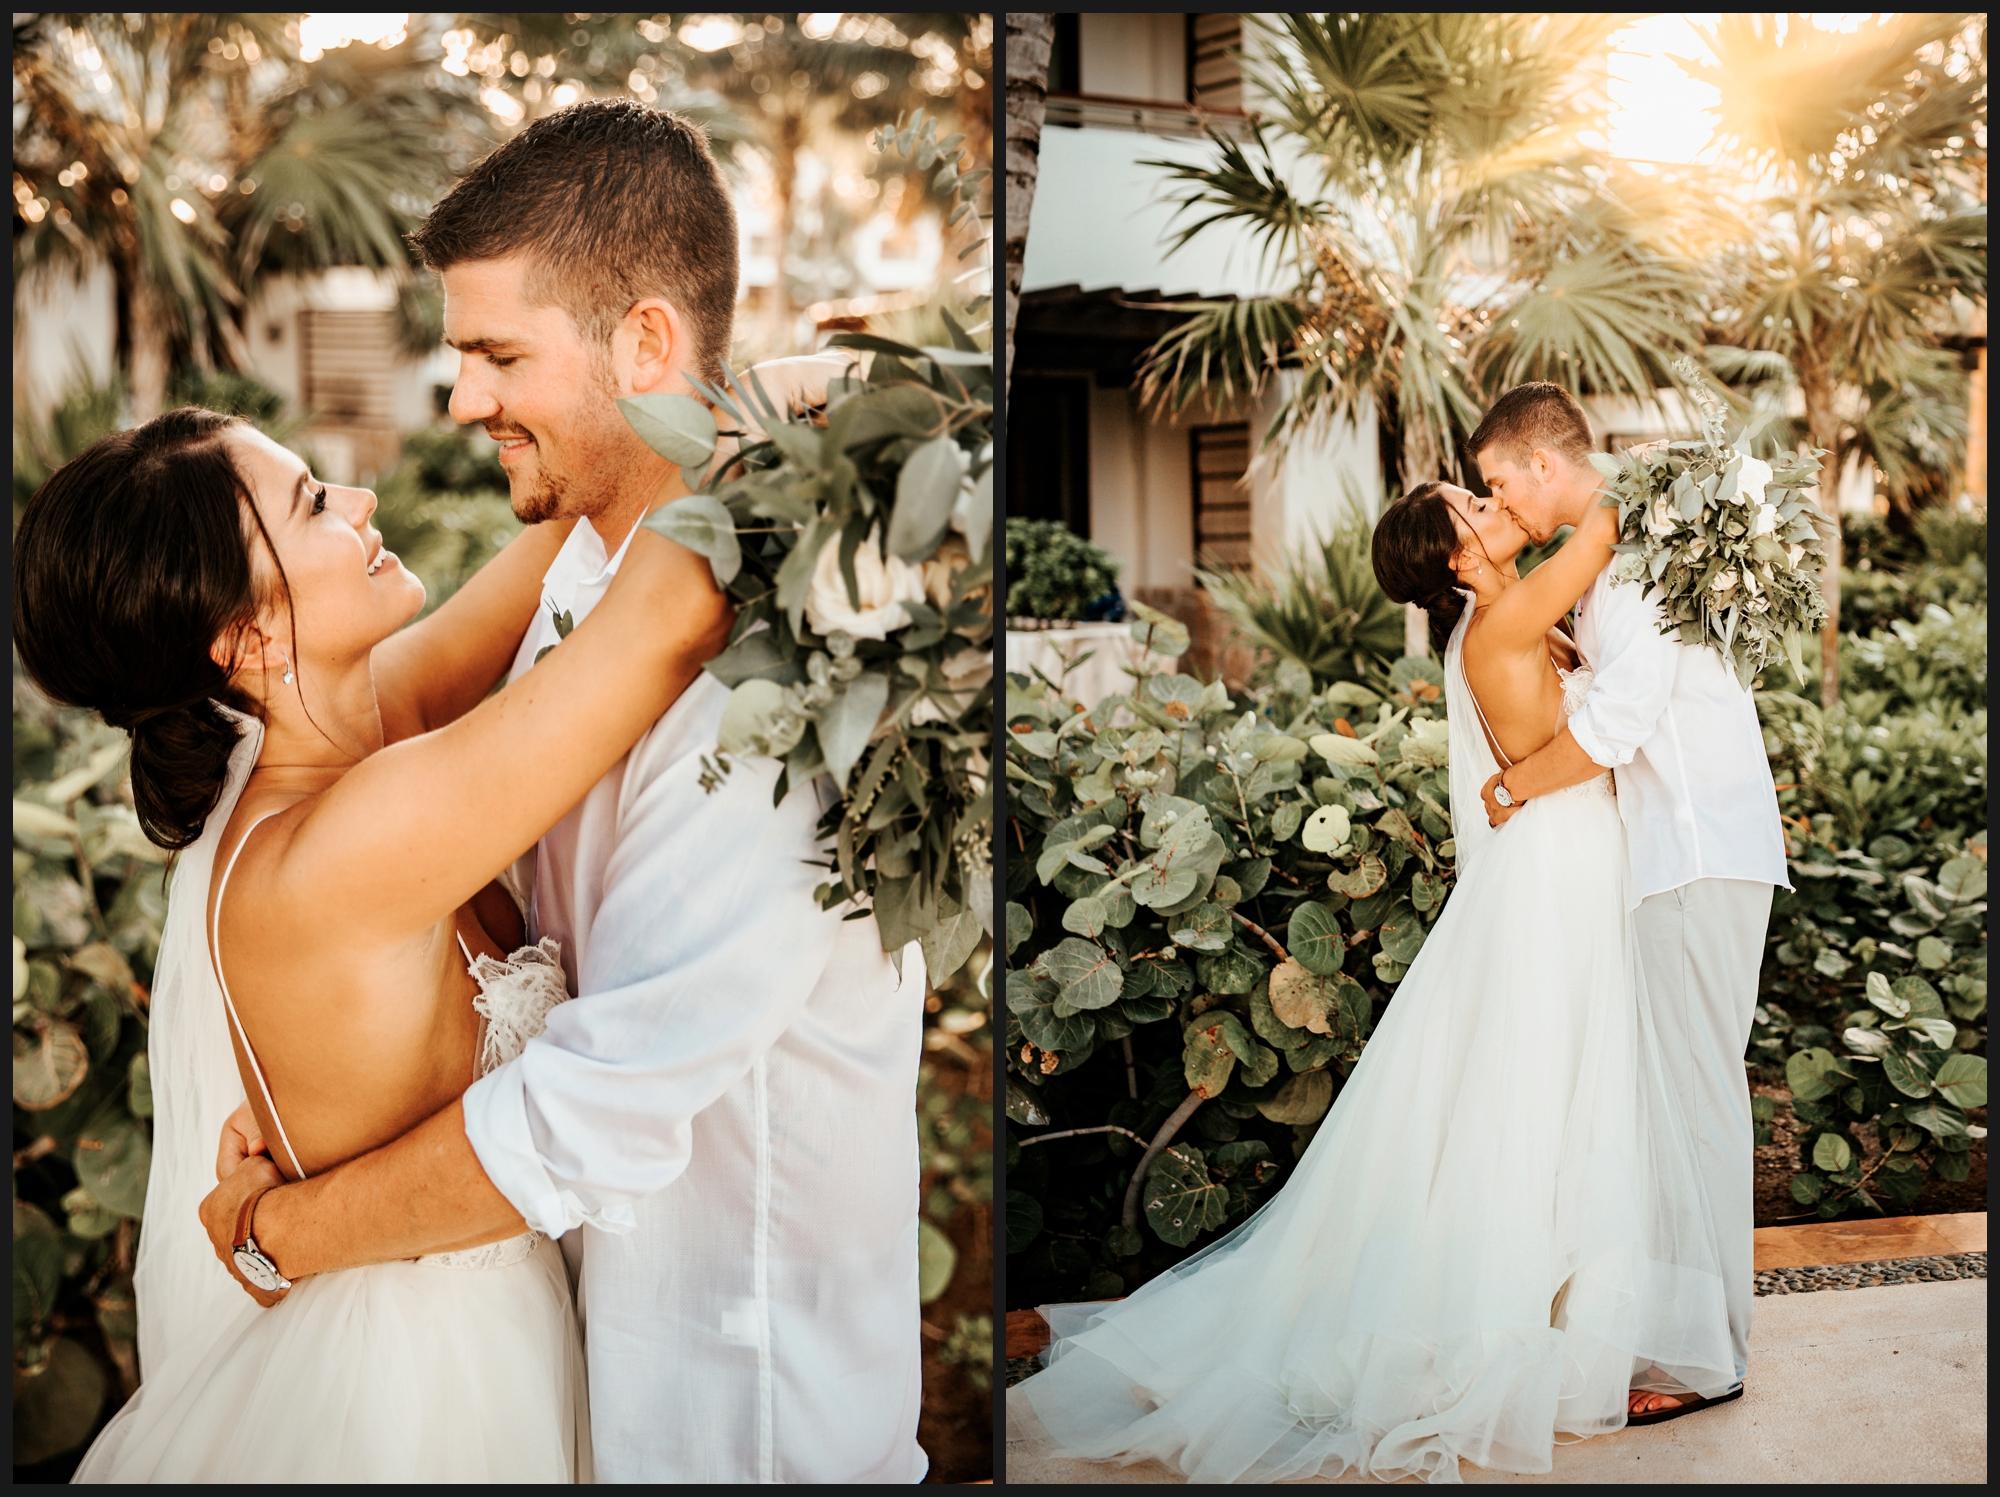 Orlando-Wedding-Photographer-destination-wedding-photographer-florida-wedding-photographer-bohemian-wedding-photographer_0470.jpg